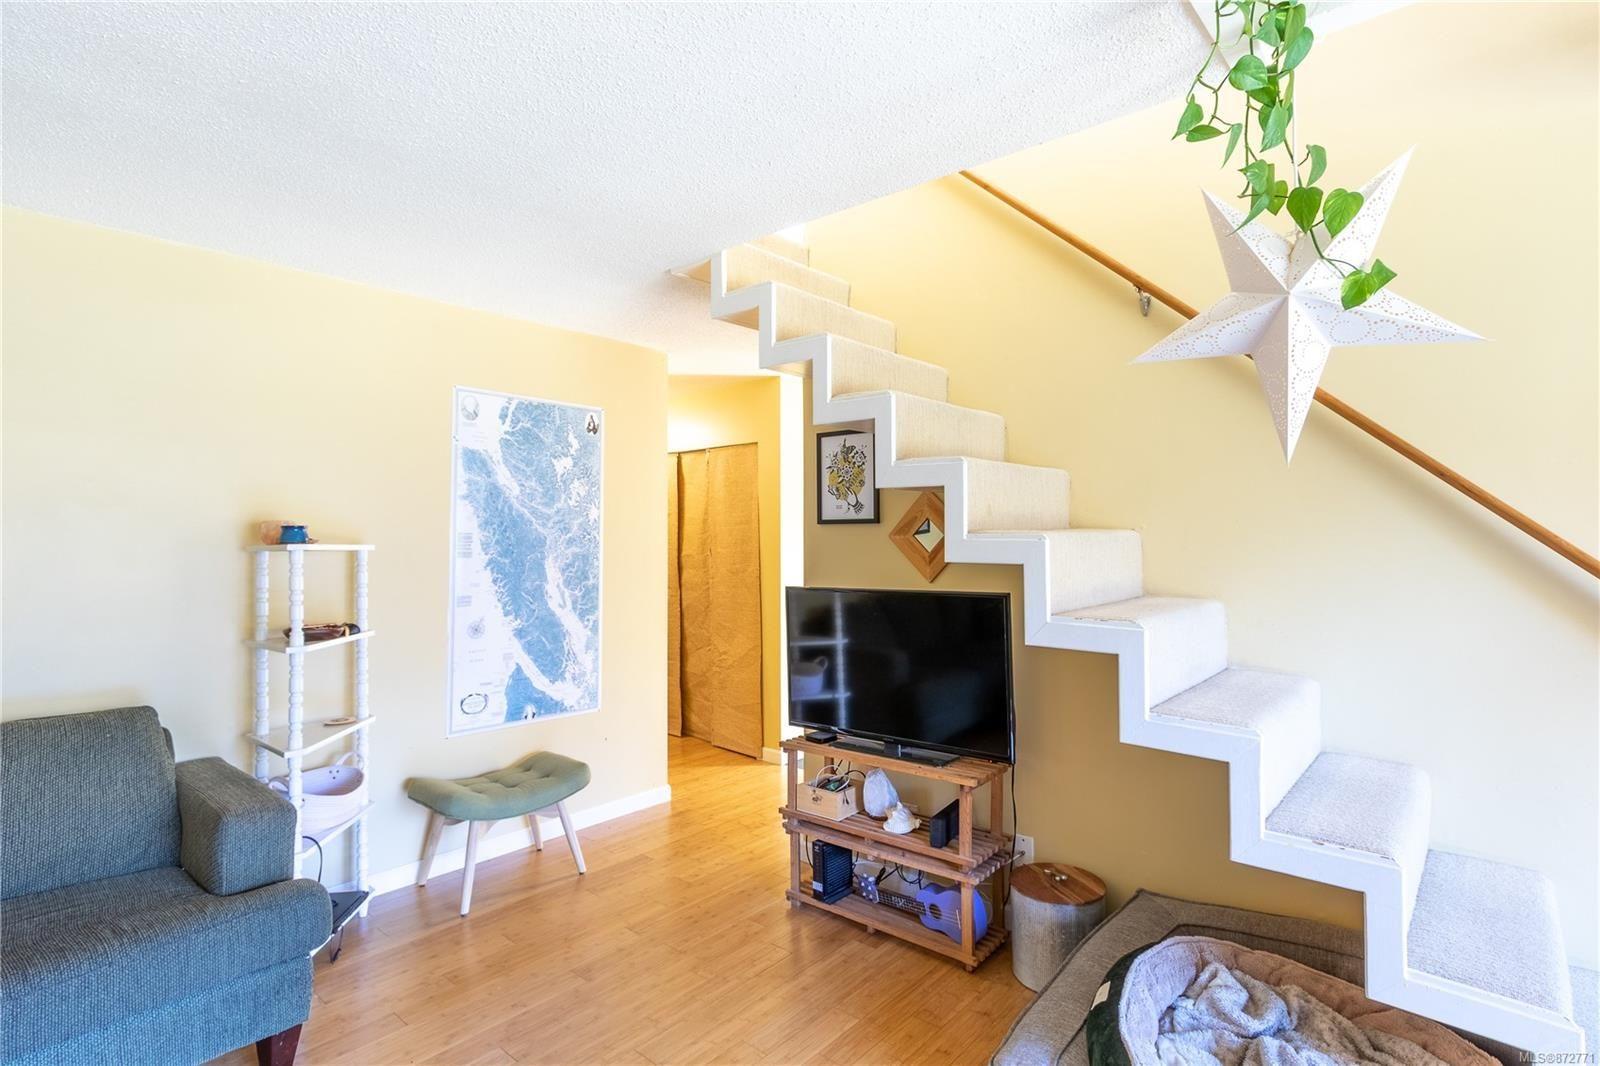 Photo 8: Photos: 305 205 1st St in : CV Courtenay City Condo for sale (Comox Valley)  : MLS®# 872771